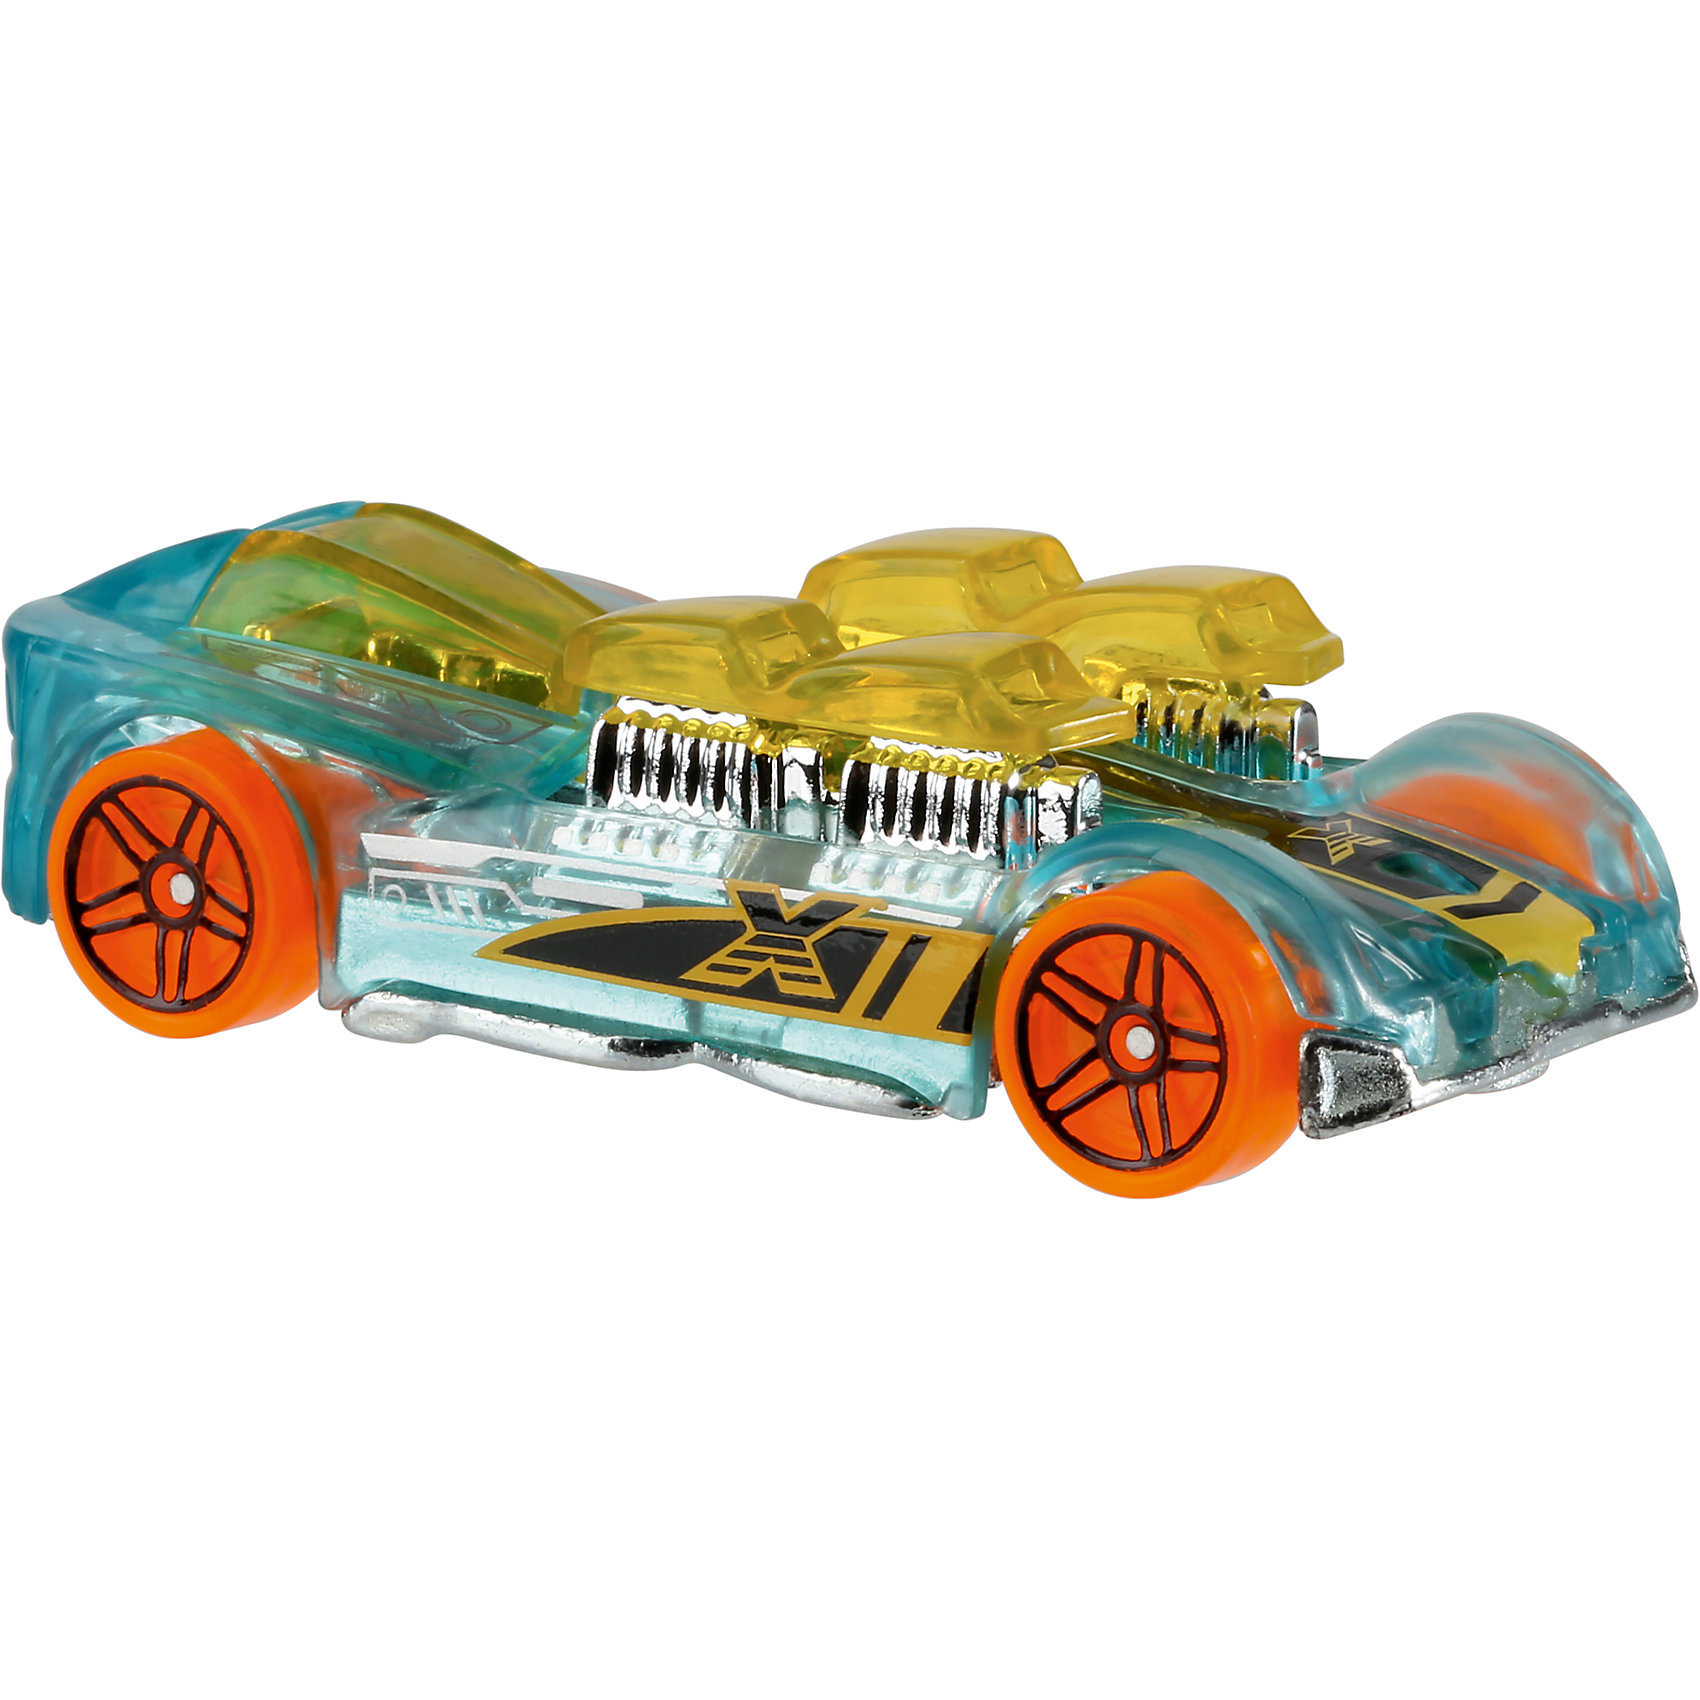 Базовая машинка Hot Wheels, What-4-2Машинки<br><br><br>Ширина мм: 110<br>Глубина мм: 45<br>Высота мм: 110<br>Вес г: 30<br>Возраст от месяцев: 36<br>Возраст до месяцев: 96<br>Пол: Мужской<br>Возраст: Детский<br>SKU: 7111104